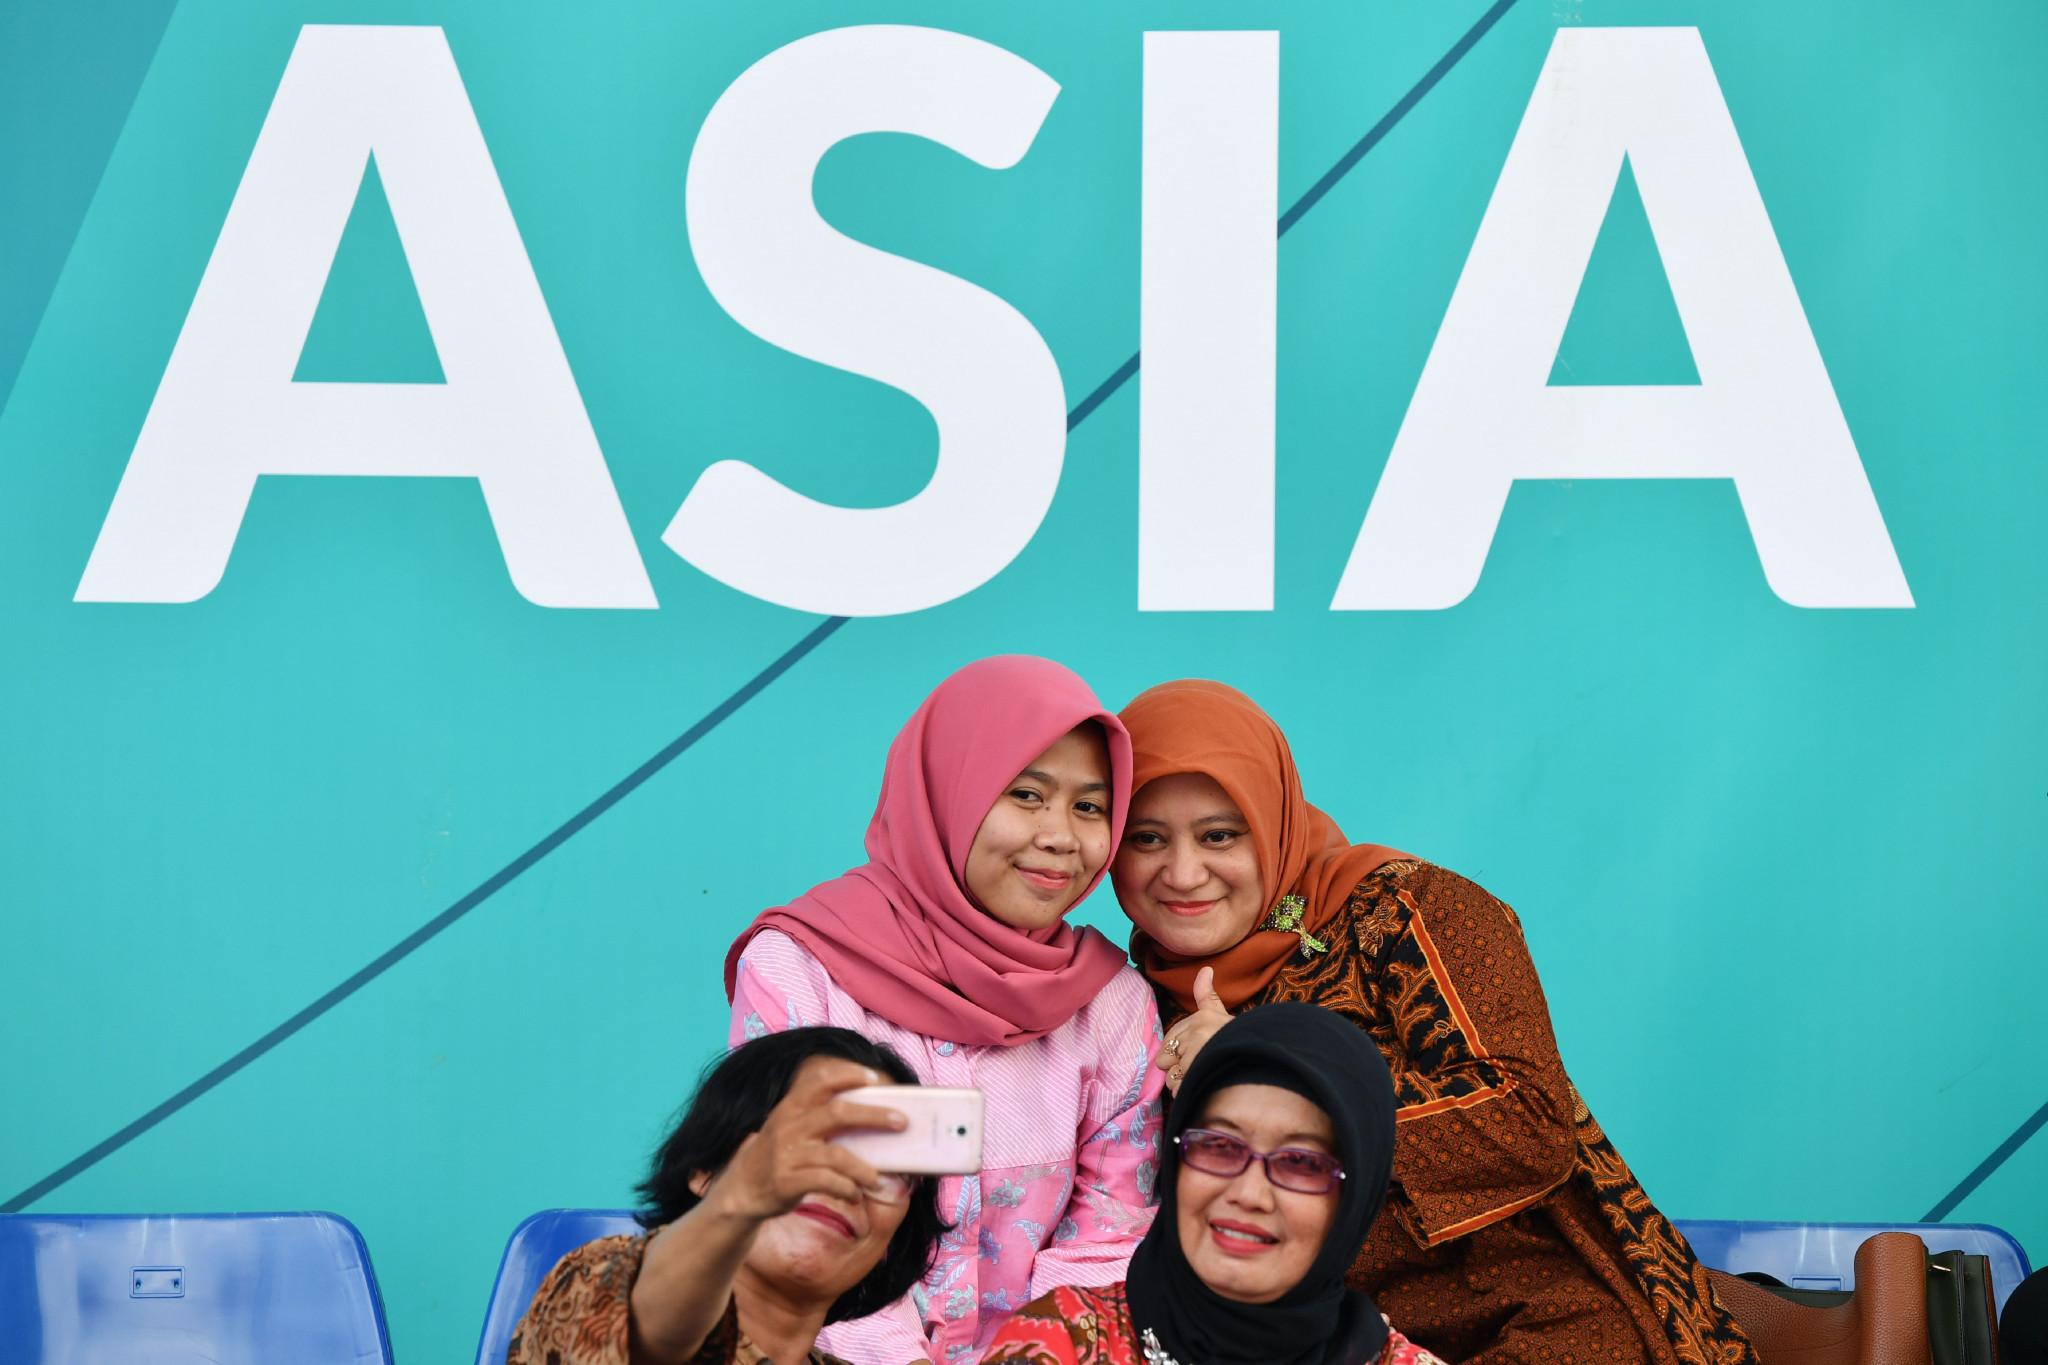 Looking back at the 2018 Asian Games in Jakarta and Palembang